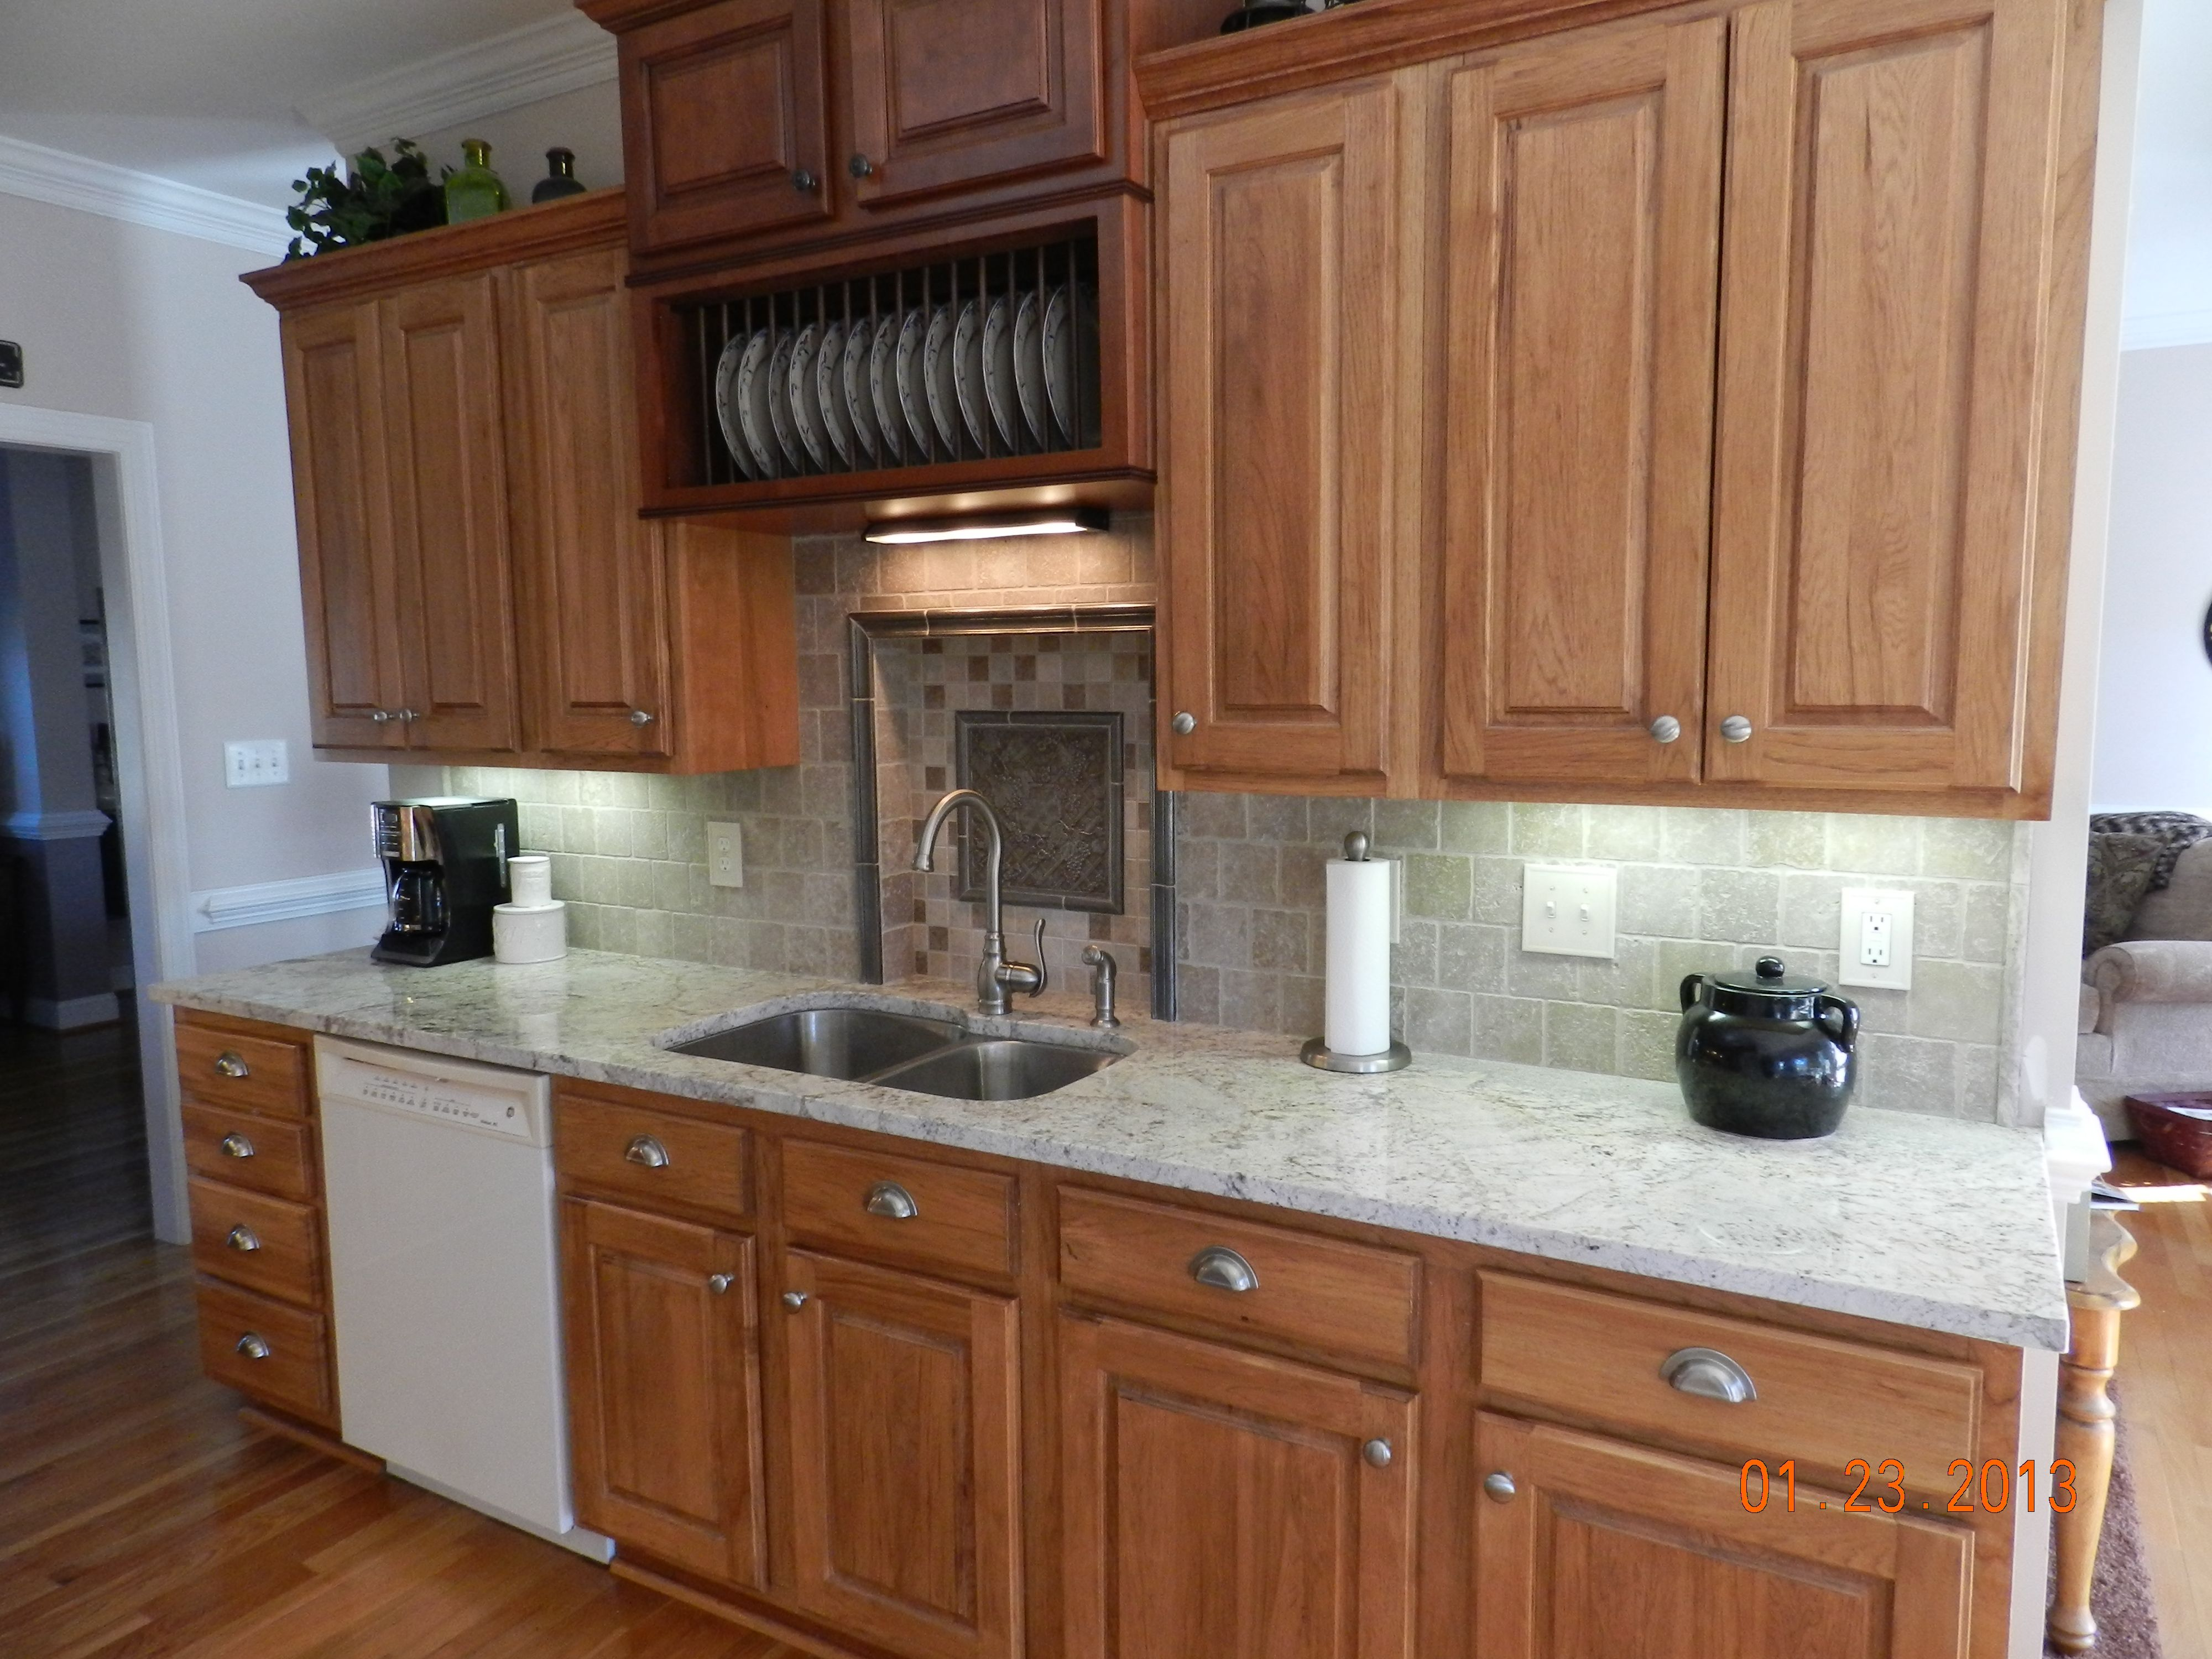 kitchen cabinets & Backsplash by Carpet One | Kitchen ...